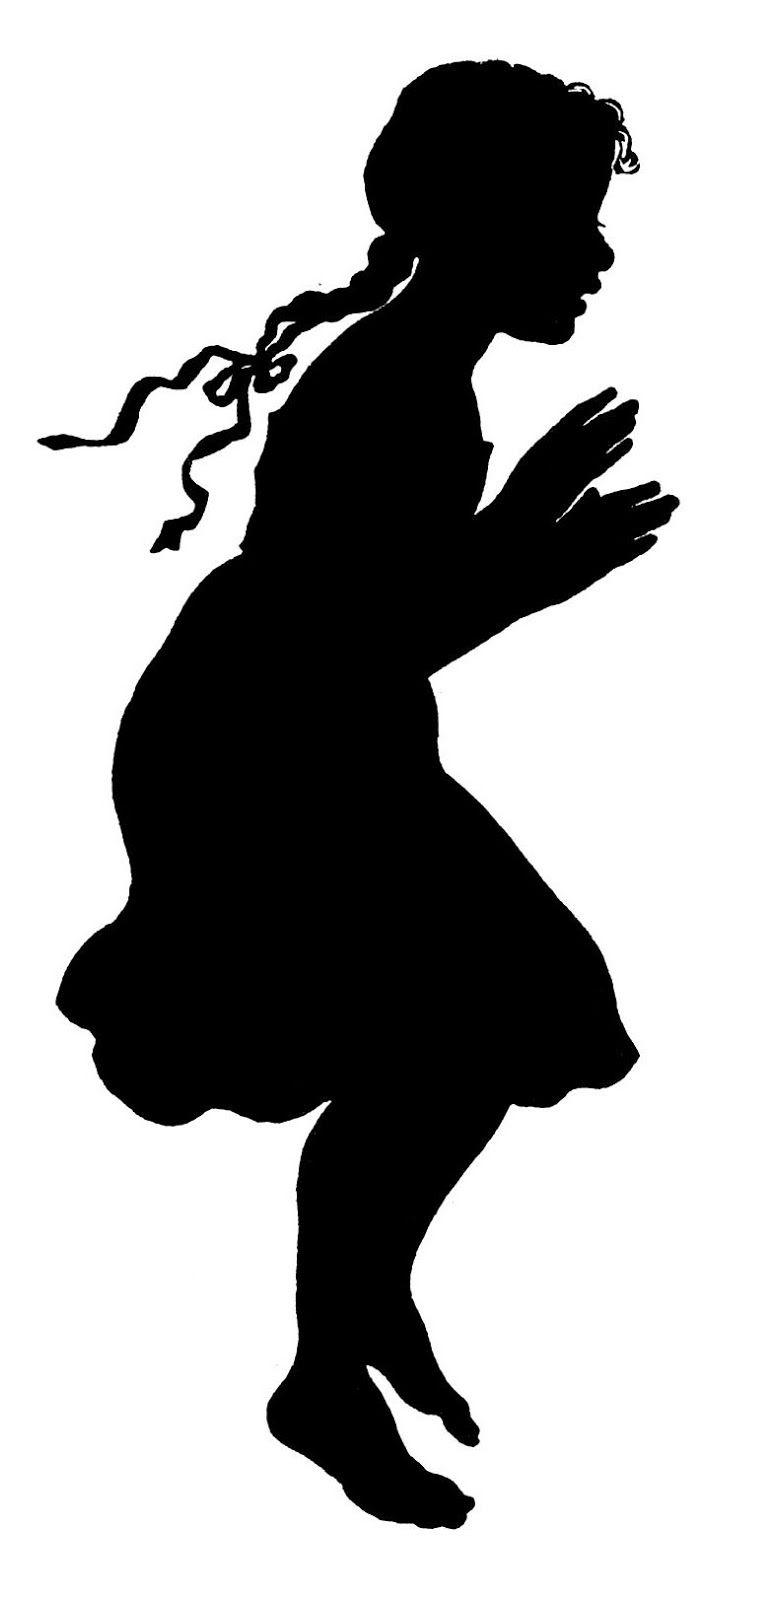 clip art girl silhouette - photo #12